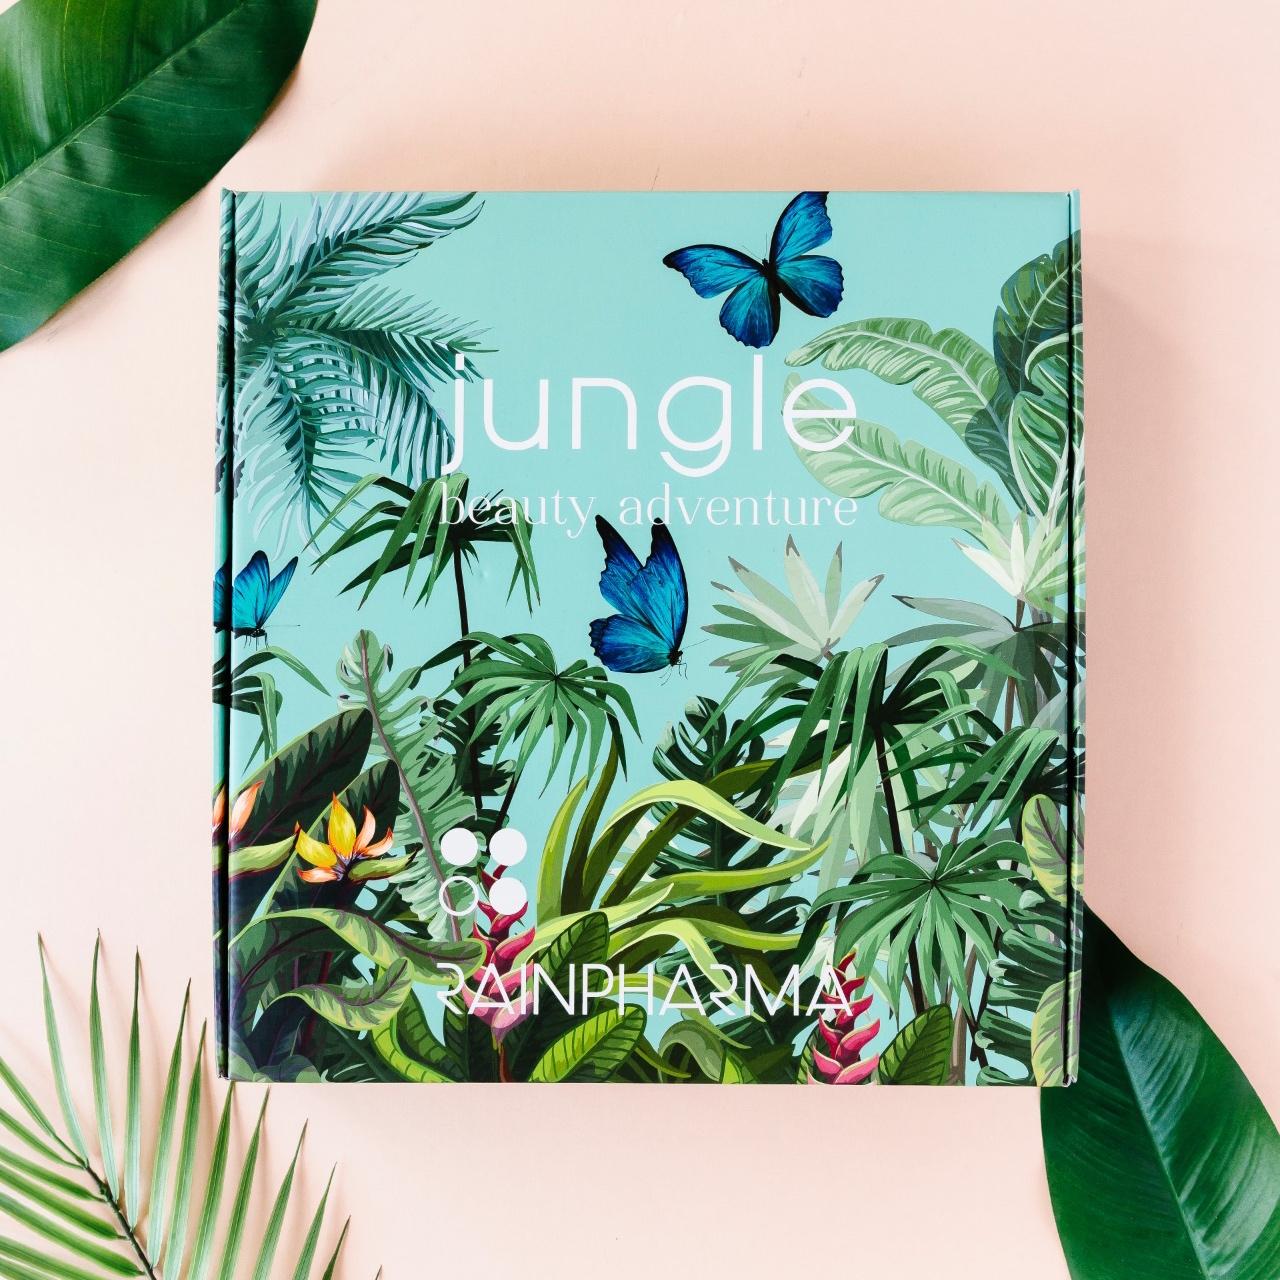 jungle-beauty-adventure-box